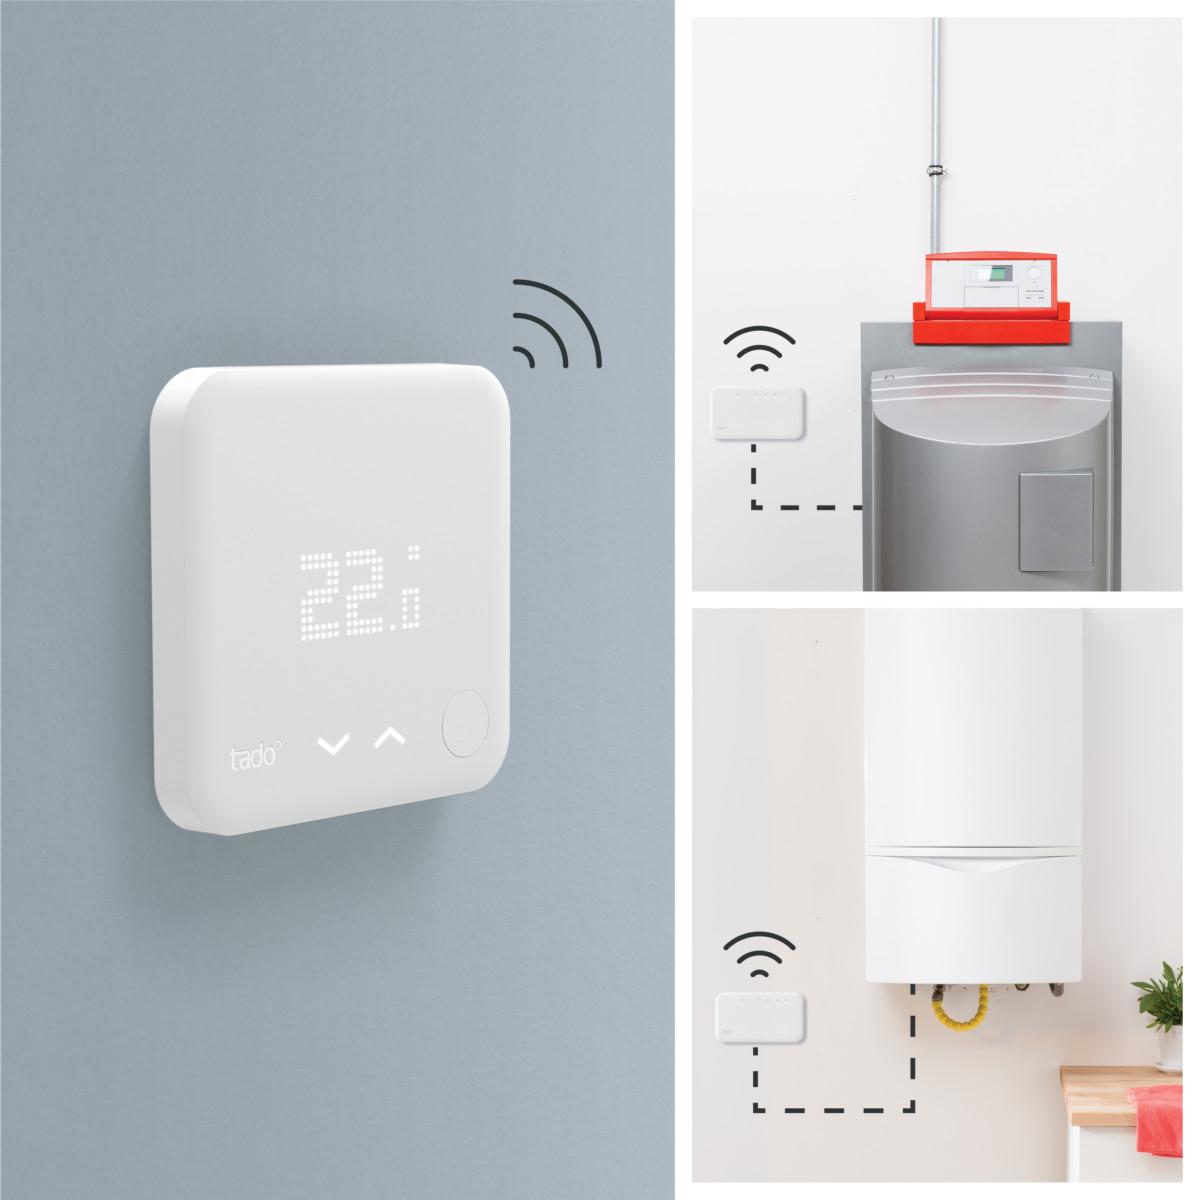 Le kit de démarrage - Thermostat intelligeng V3+ sans fil